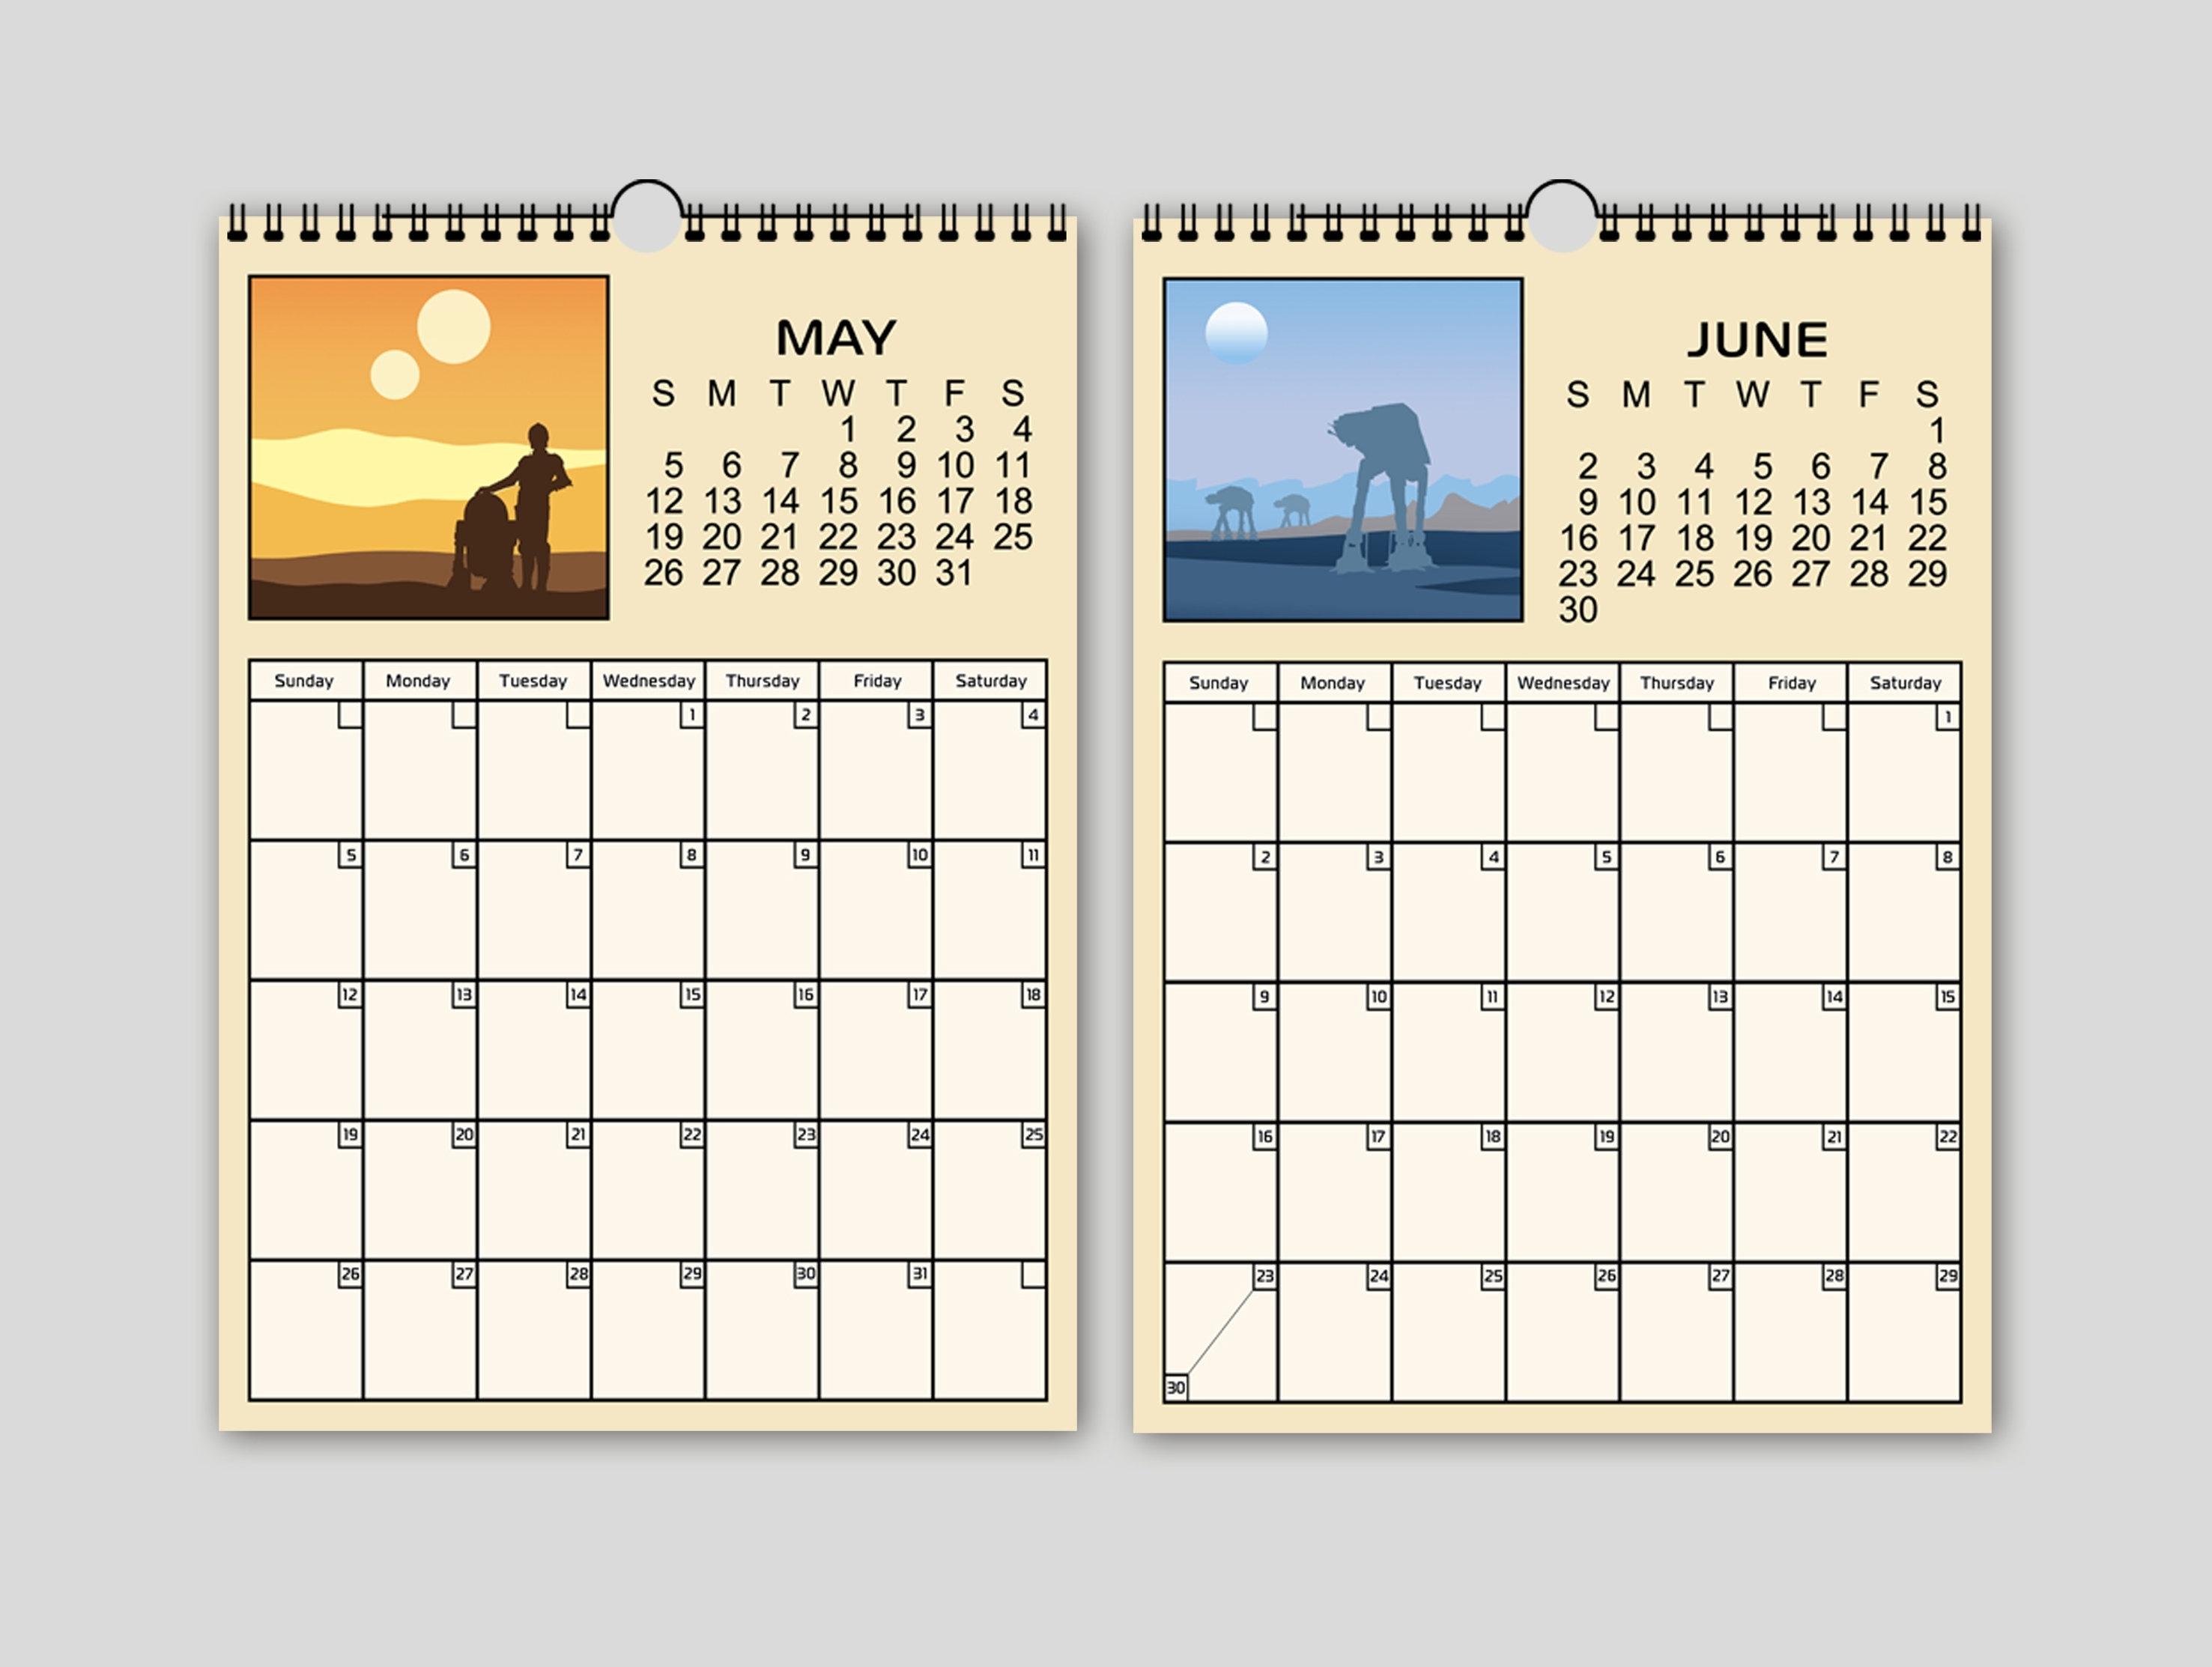 Wall Calendar / Calendar 2019 / Calendar Star Wars / Planner Star Wars /  Star Wars Print / Star Wars Poster / Star Wars Gift / Star Wars Art